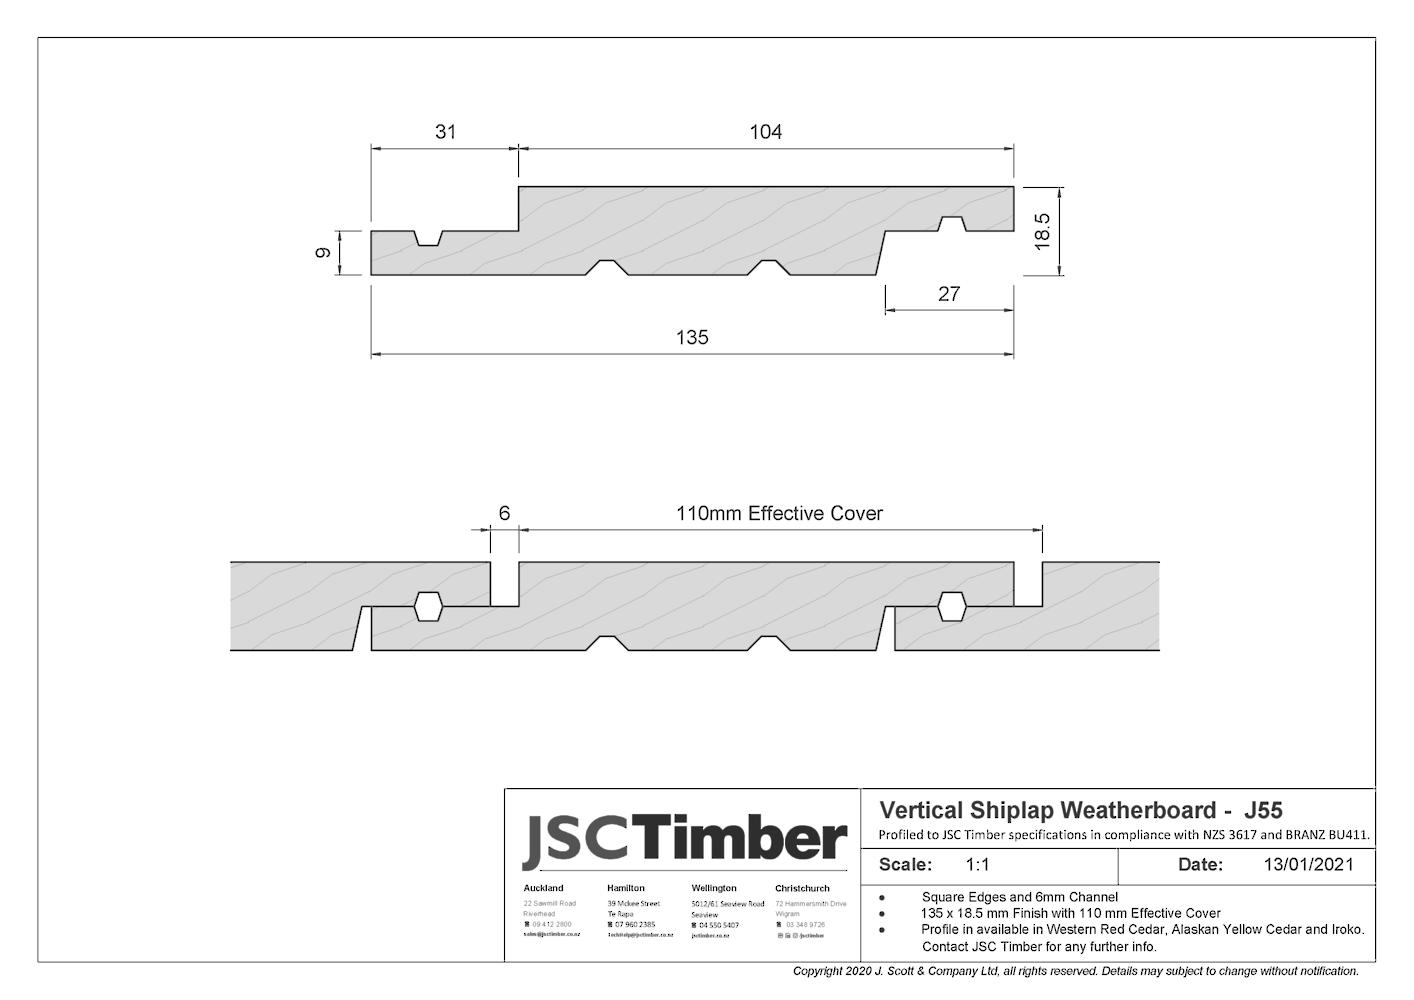 J55 Vertical Shiplap Weatherboard